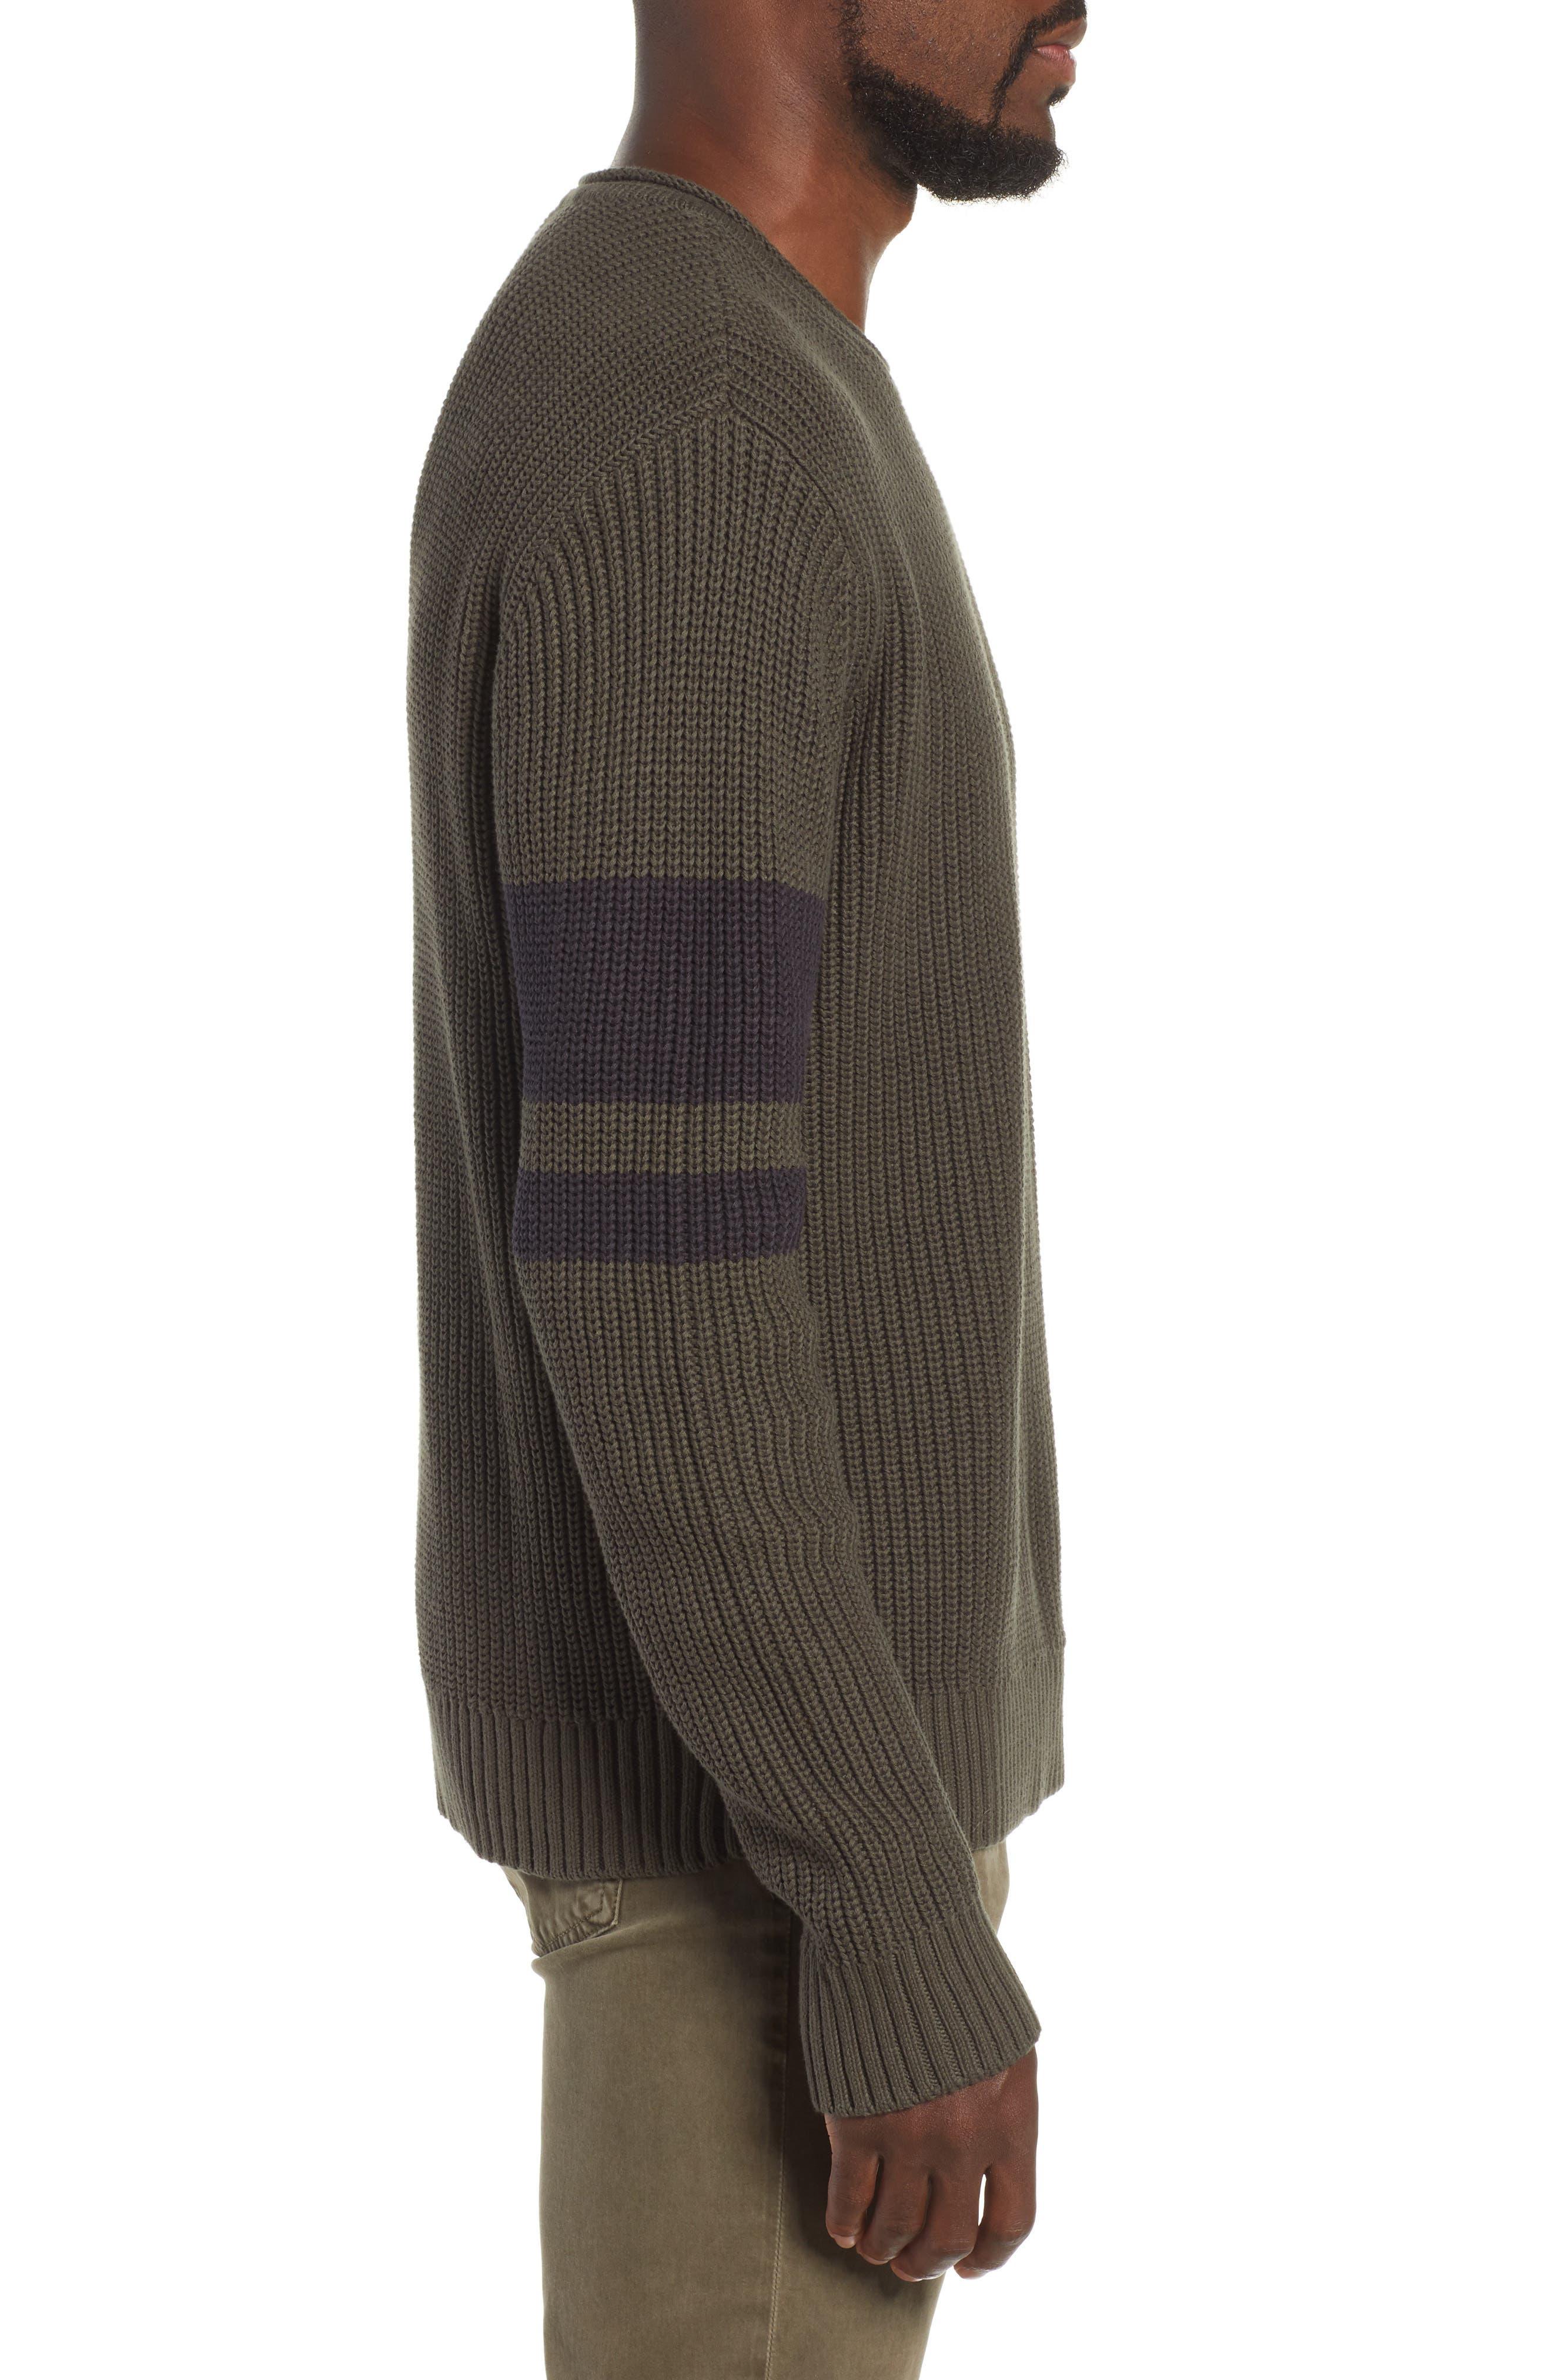 Jett Slim Fit Crewneck Sweater,                             Alternate thumbnail 3, color,                             OAK GROVE/ BLACK